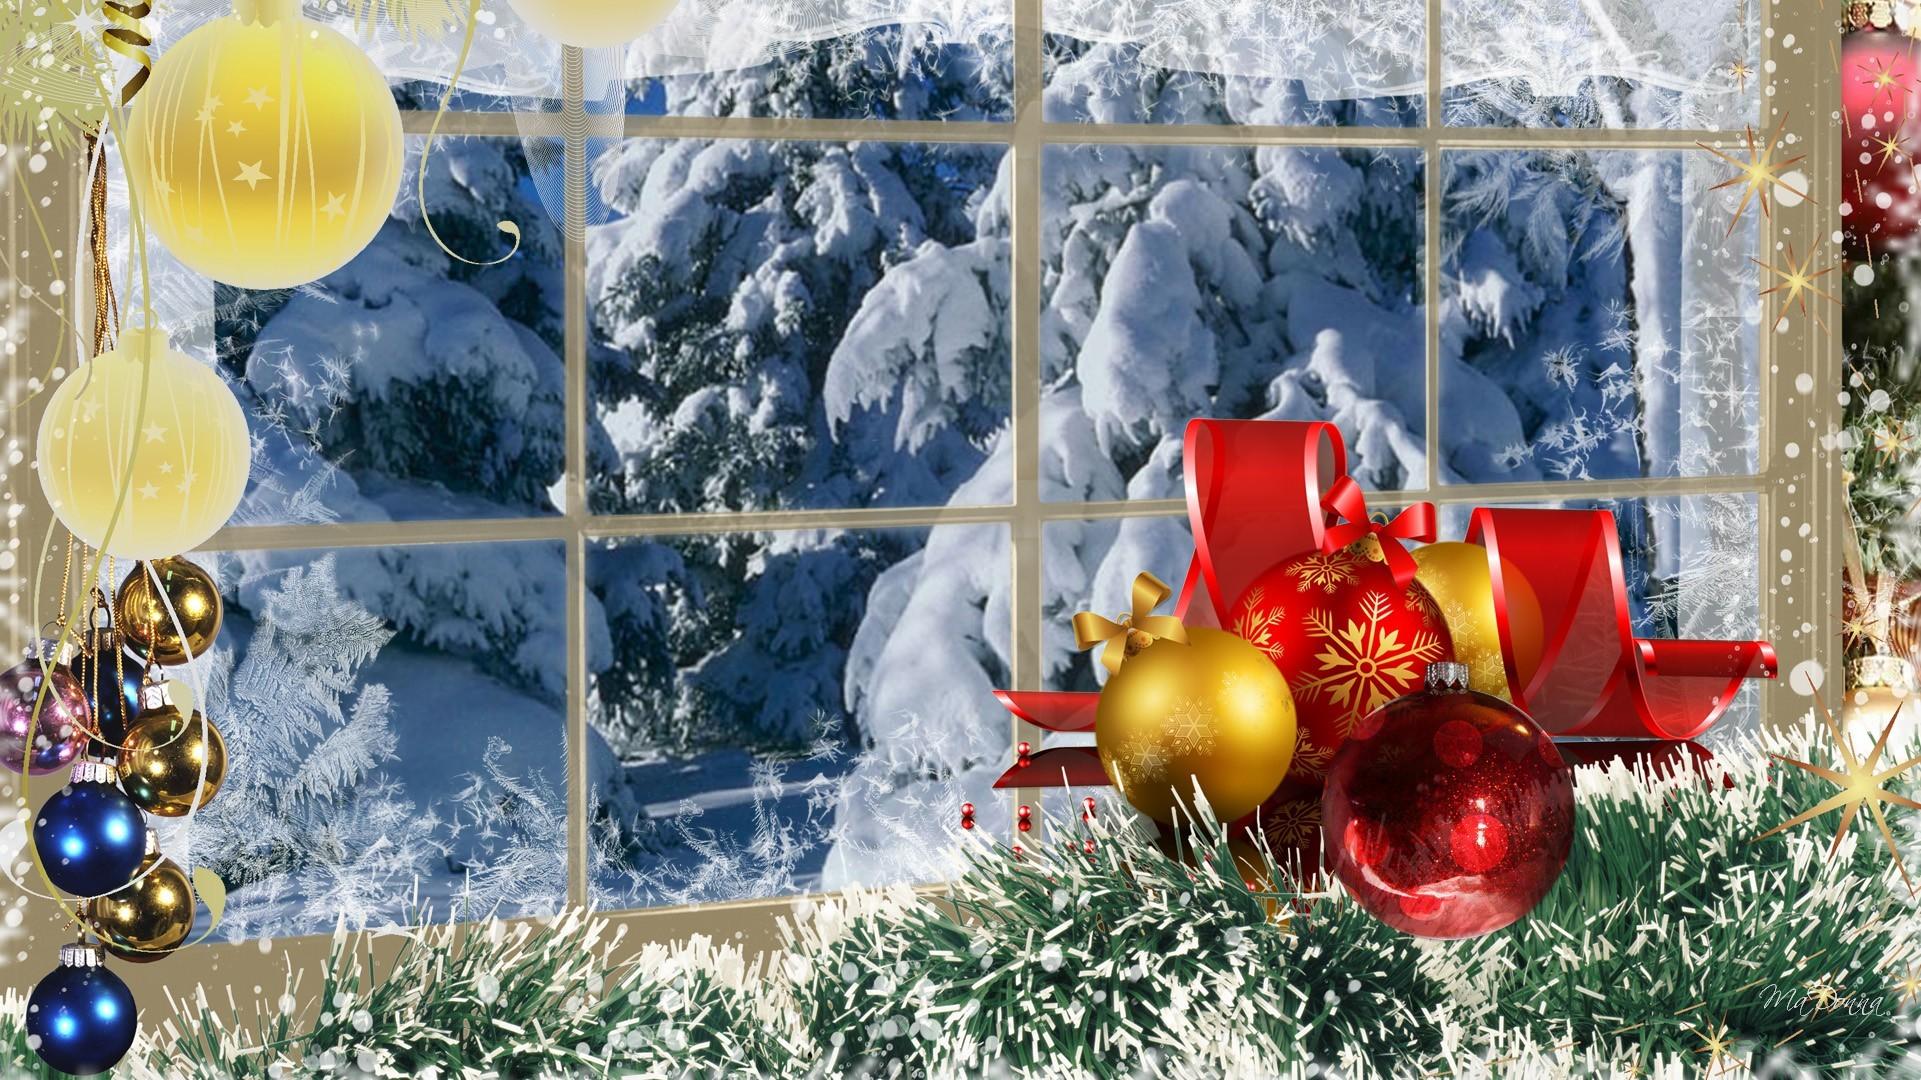 Christmas snow scene wallpaper wallpapertag - Christmas nature wallpaper ...